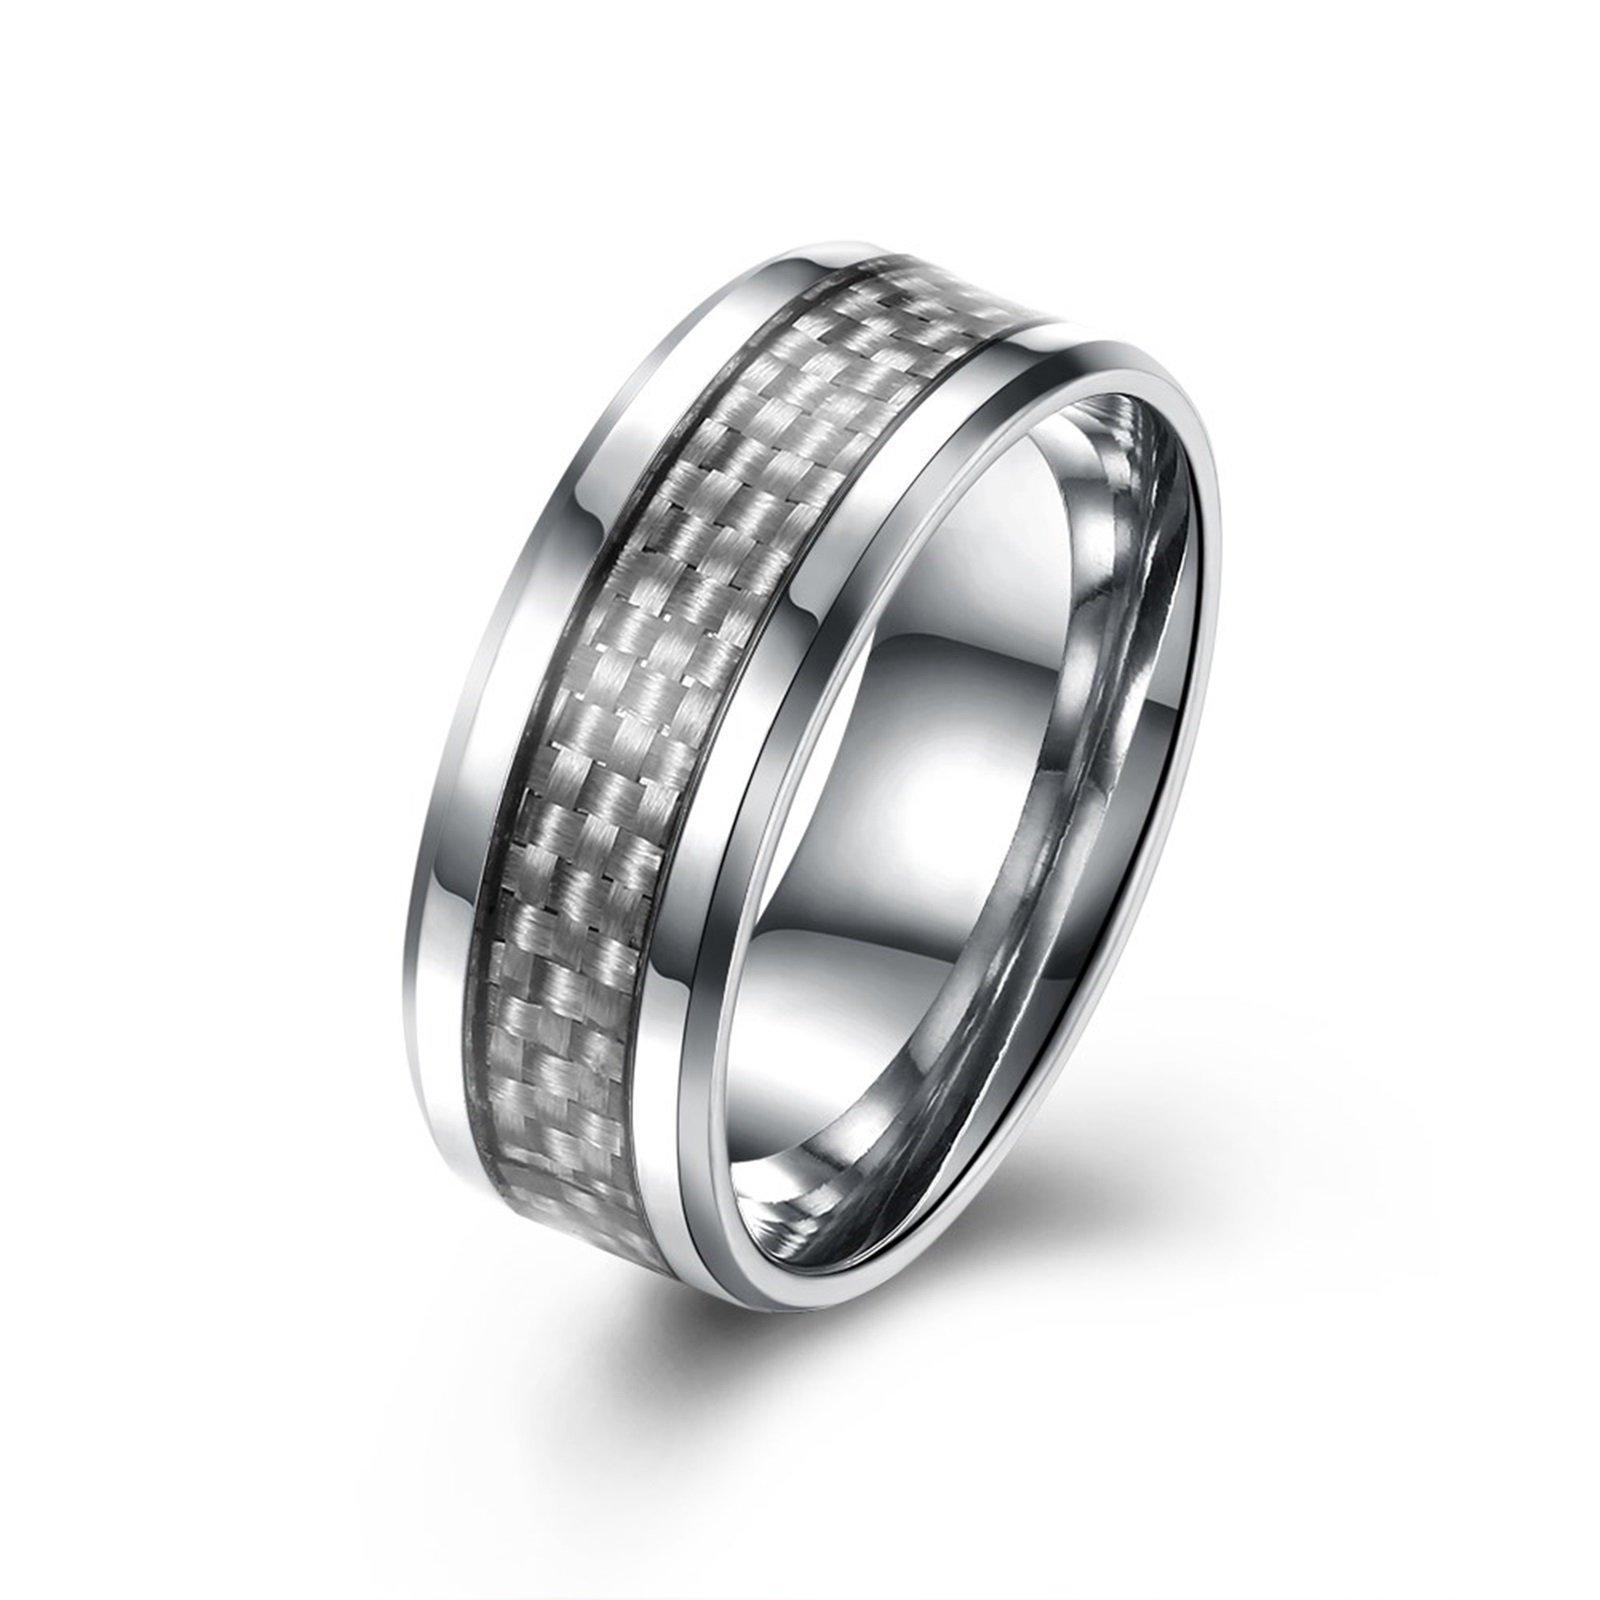 AnaZoz Fashion Rings, Stainless Steel 8MM Men's Titanium Ring Wedding Band Carbon Fiber Inlay Size 9